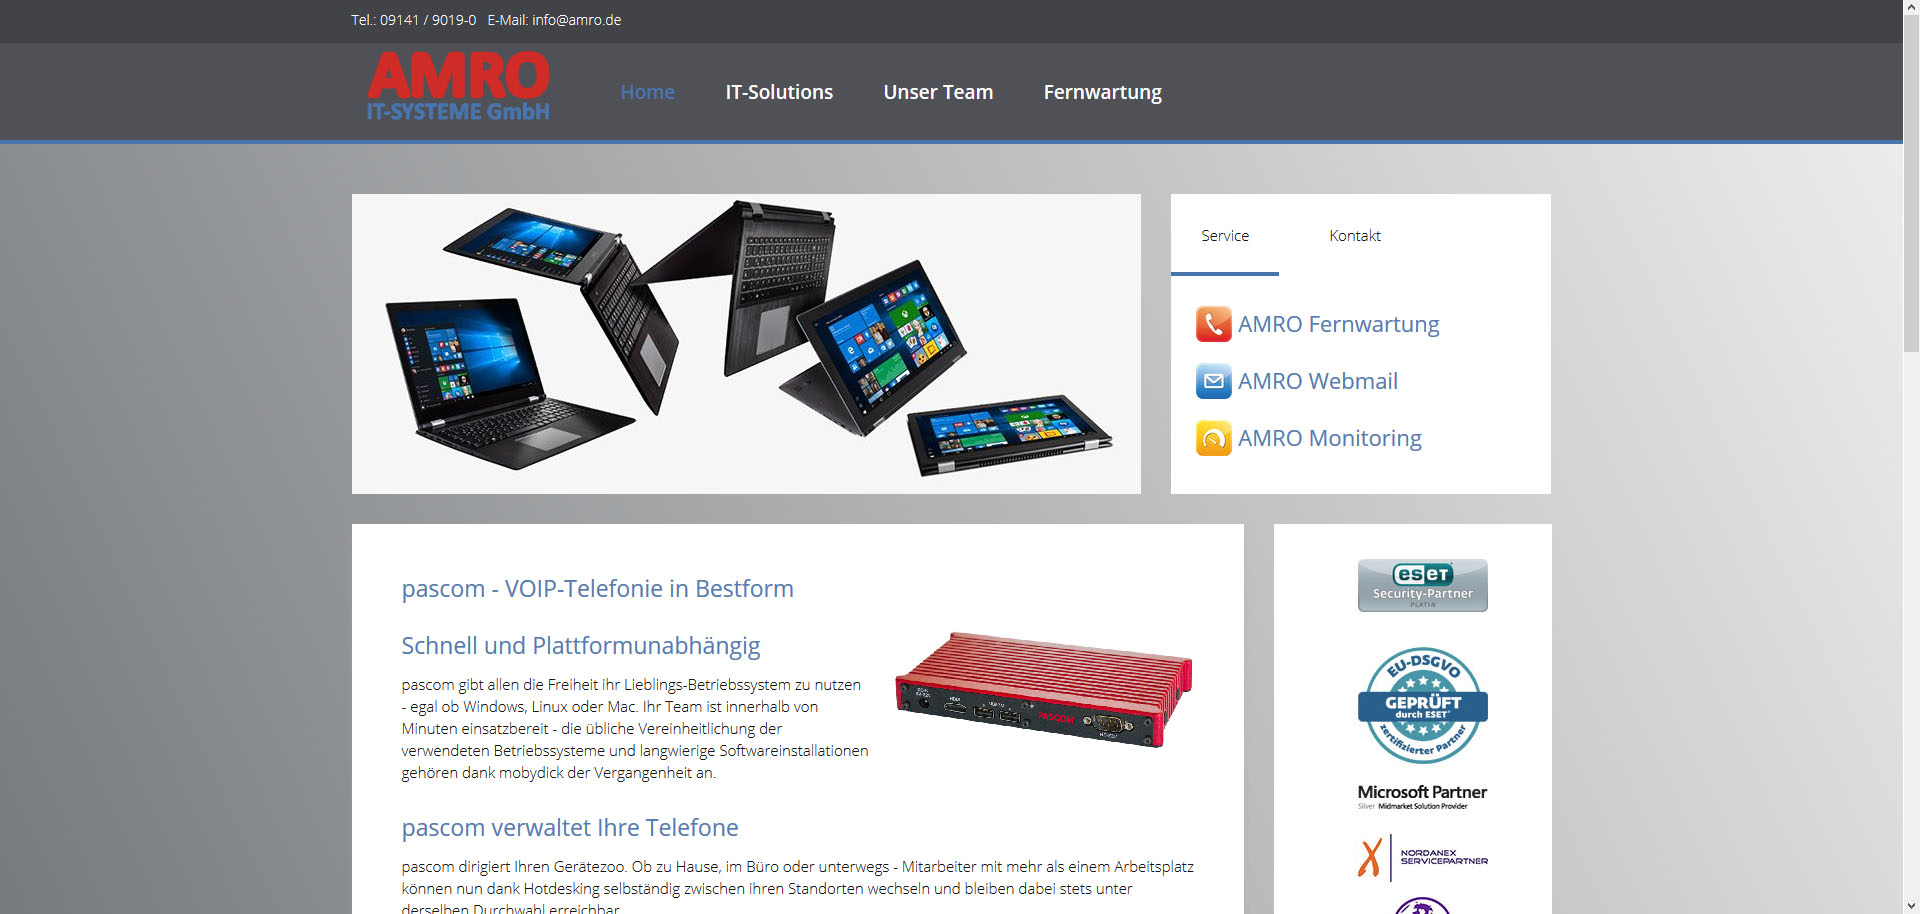 AMRO IT-Systeme GmbH